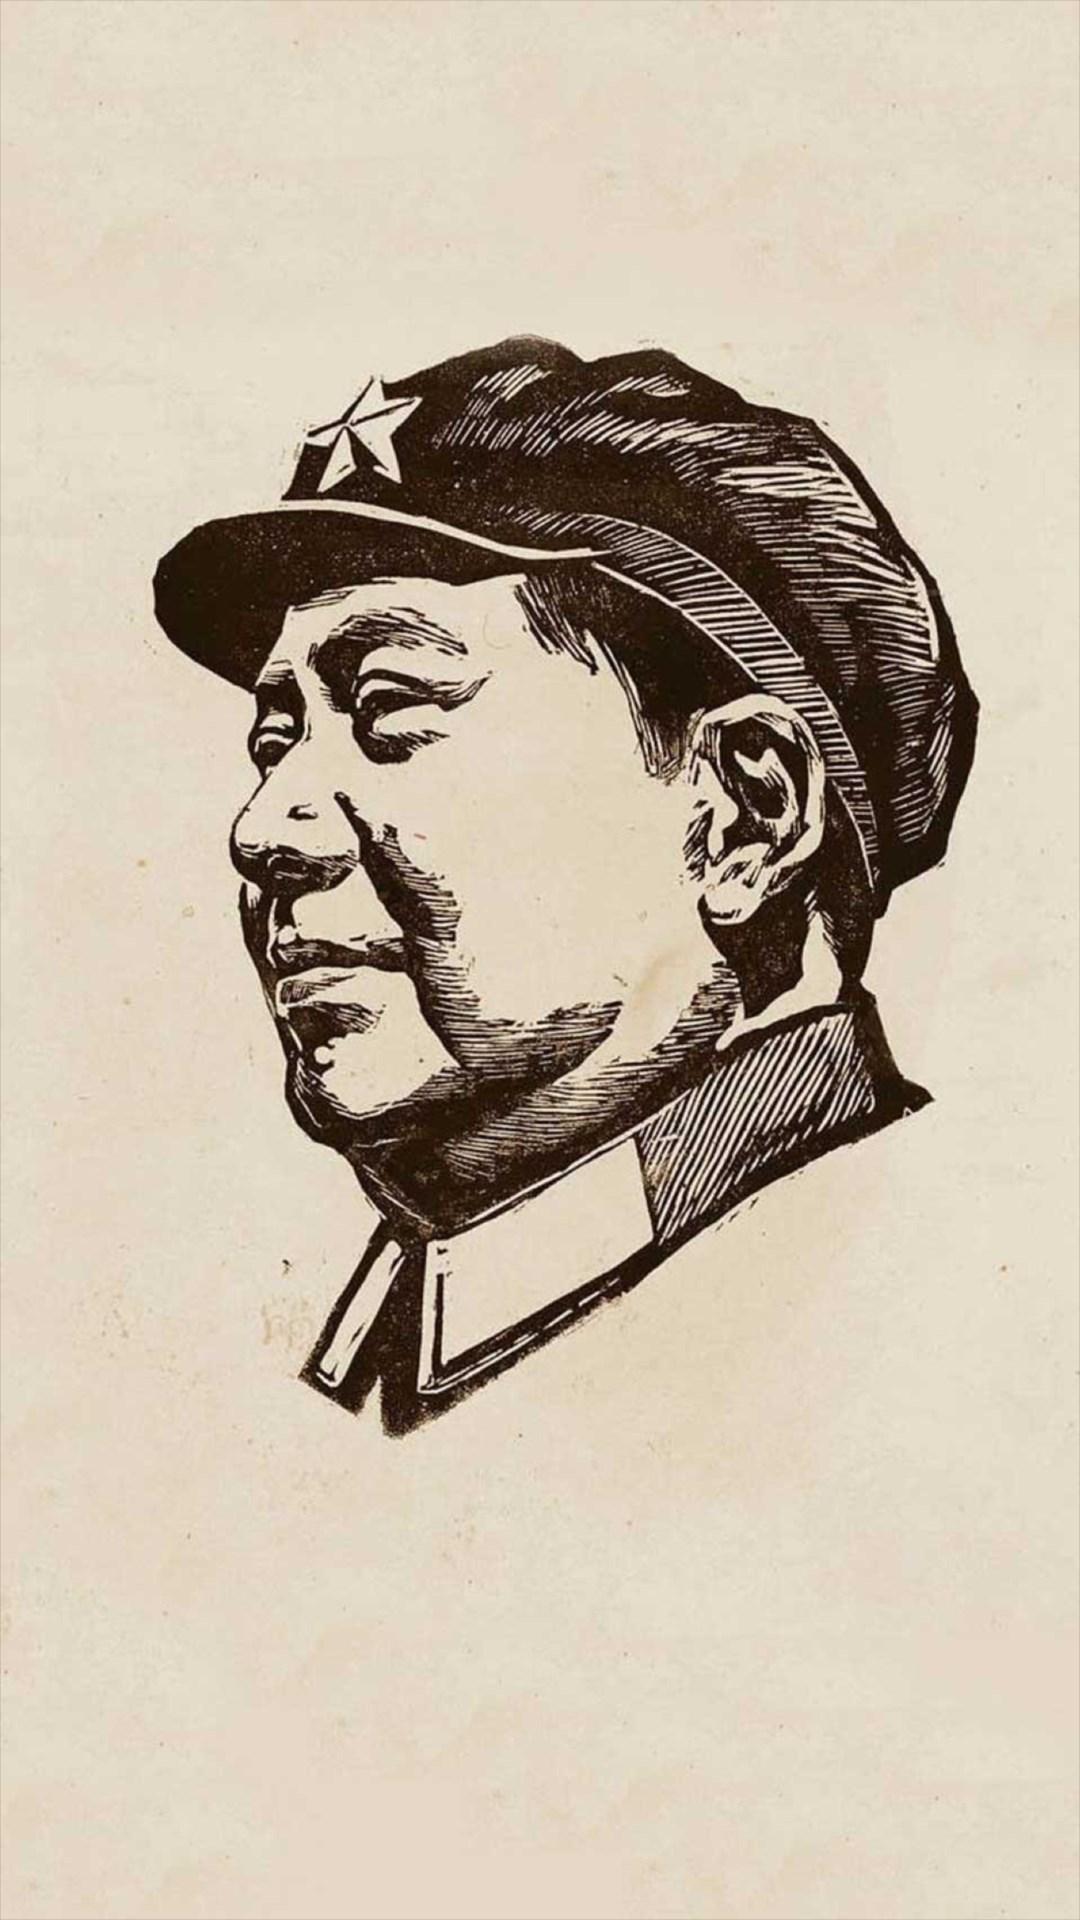 Chinese Revolutionary Leader Portrait Drawn Art iPhone 8 1080x1920